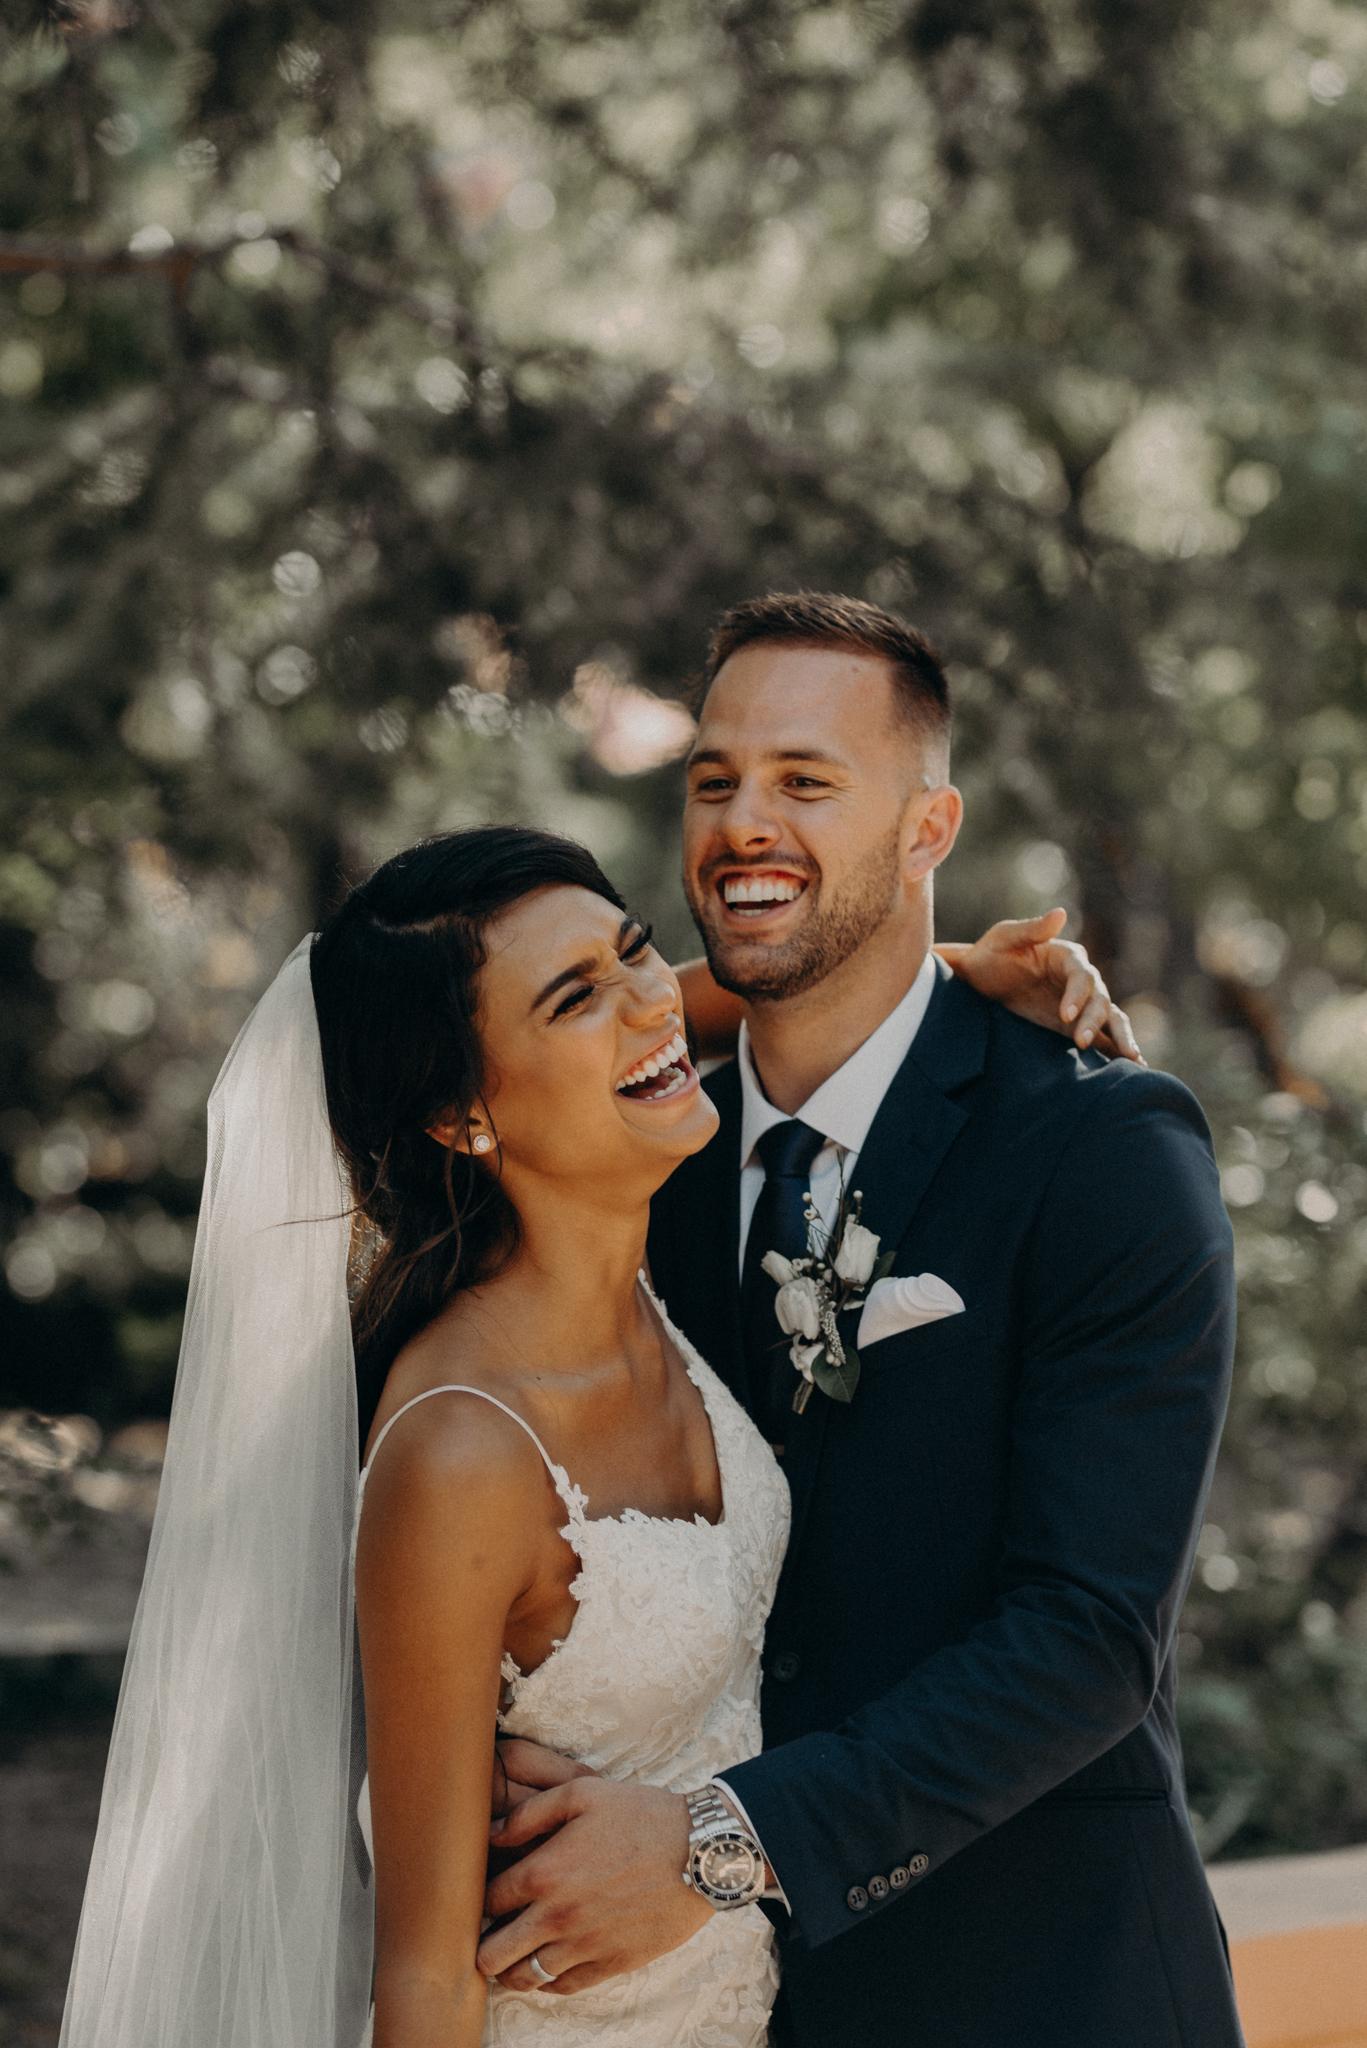 Isaiah + Taylor Photography - Rancho Las Lomas Wedding, Los Angeles Wedding Photographer-083.jpg